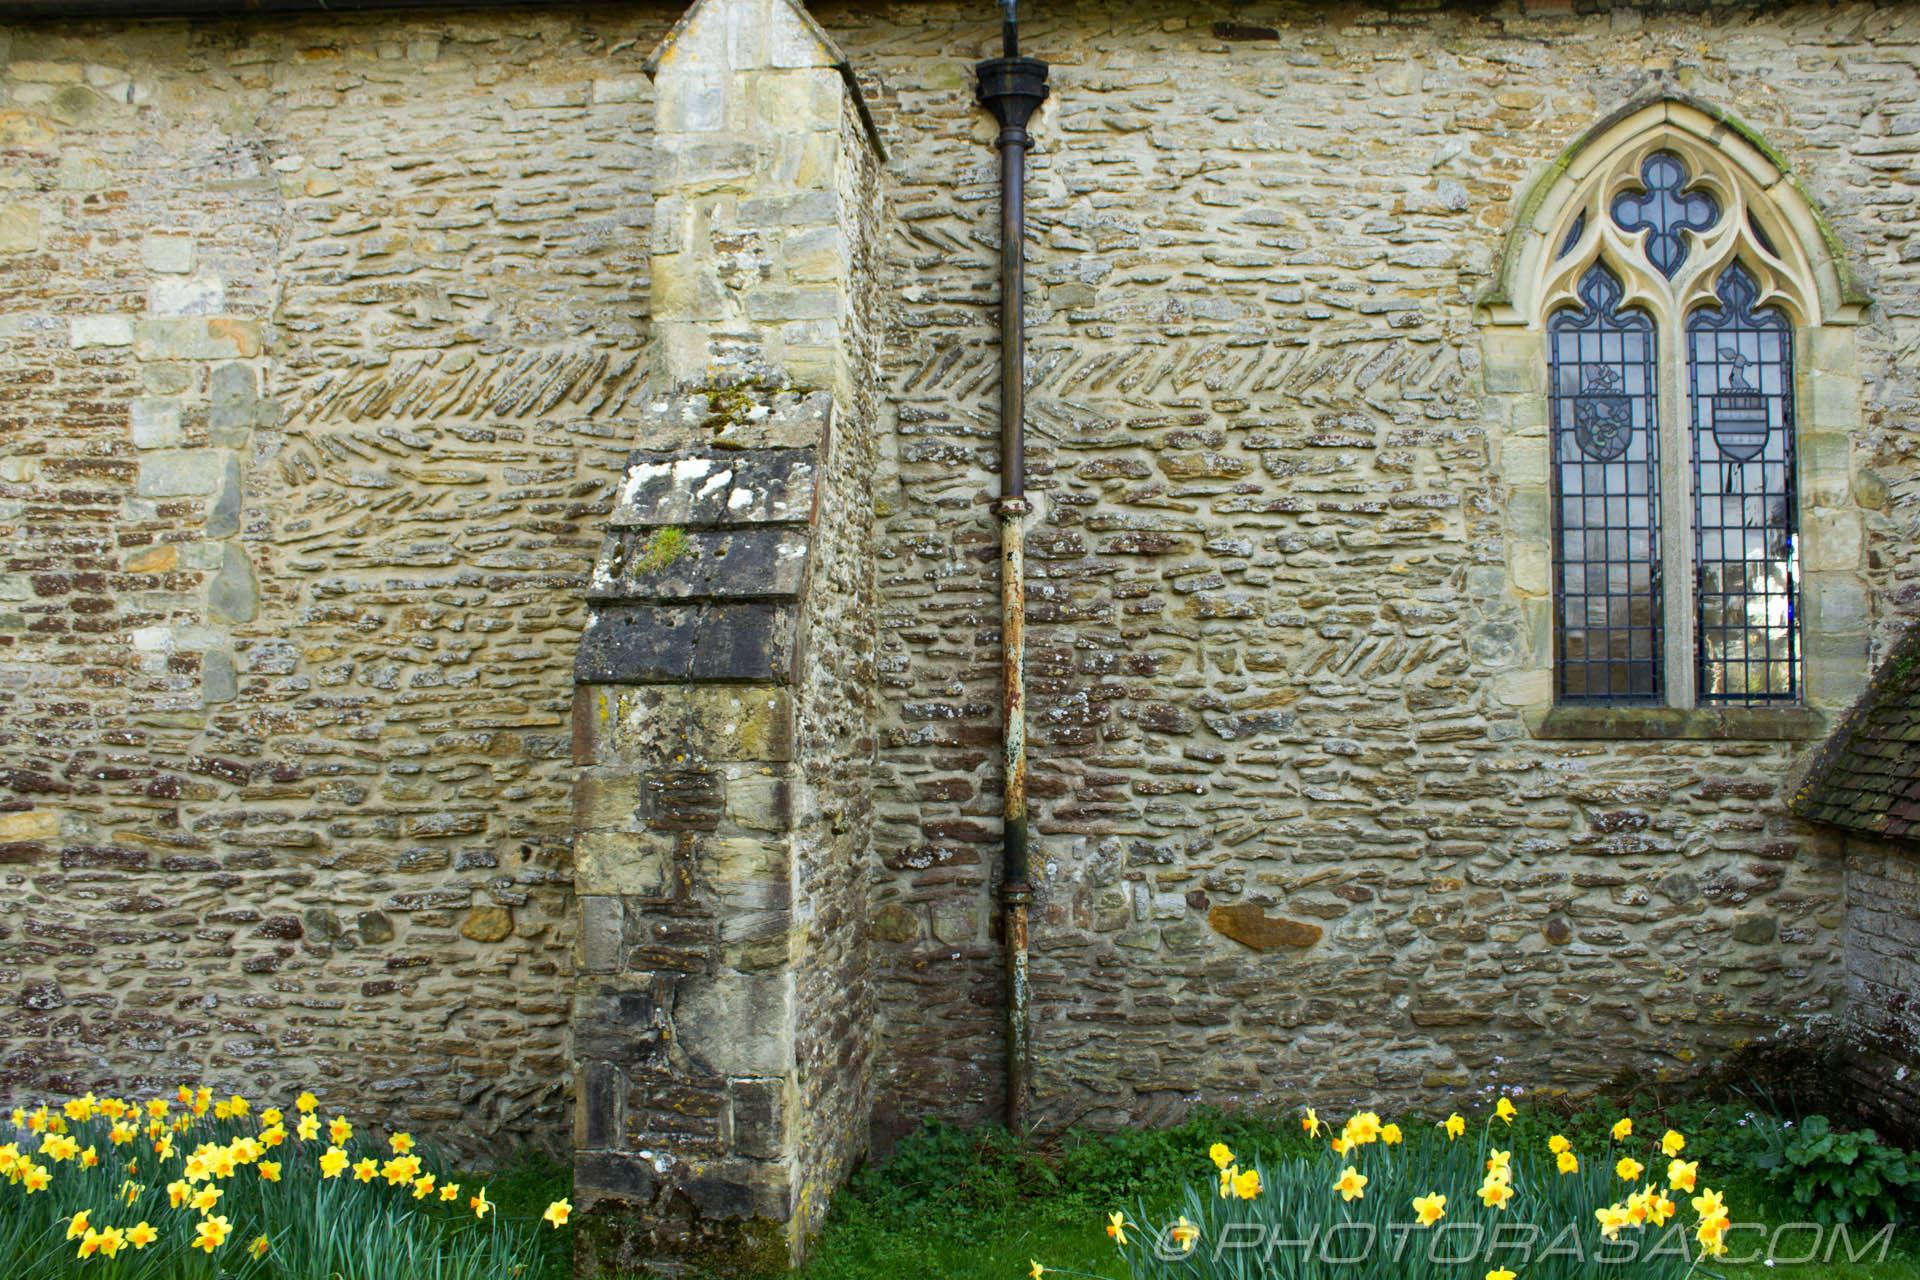 https://photorasa.com/saints-church-staplehurst-kent/medieval-herring-bone-brickwork/